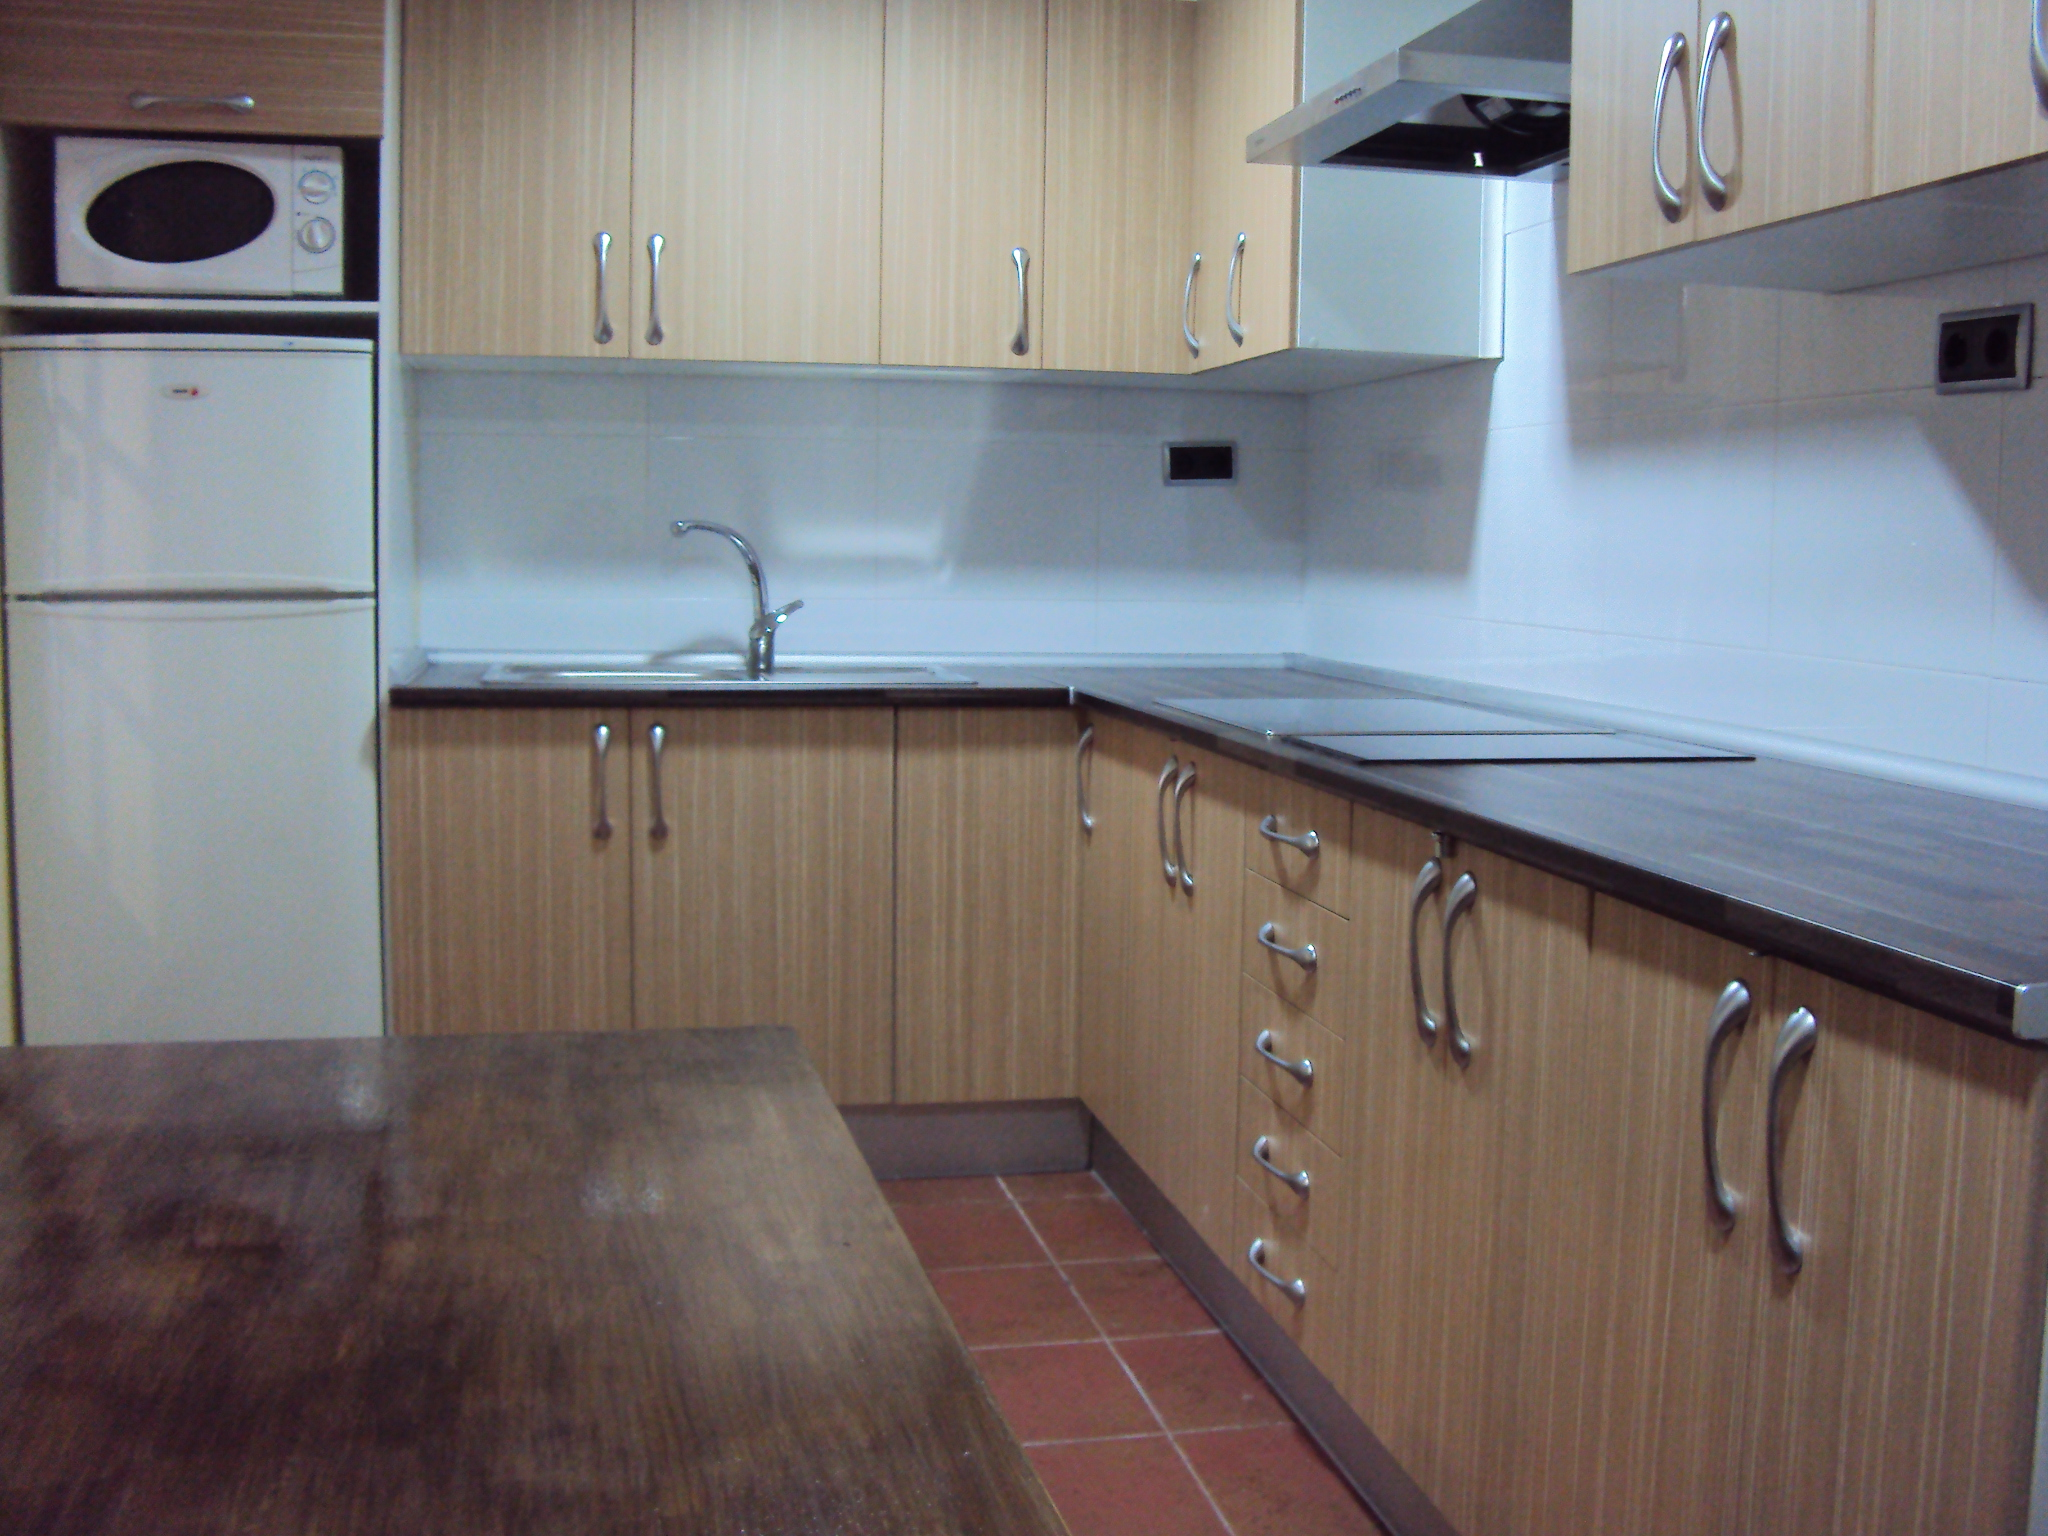 Cocinas ancla dorada - Ver cocinas amuebladas ...